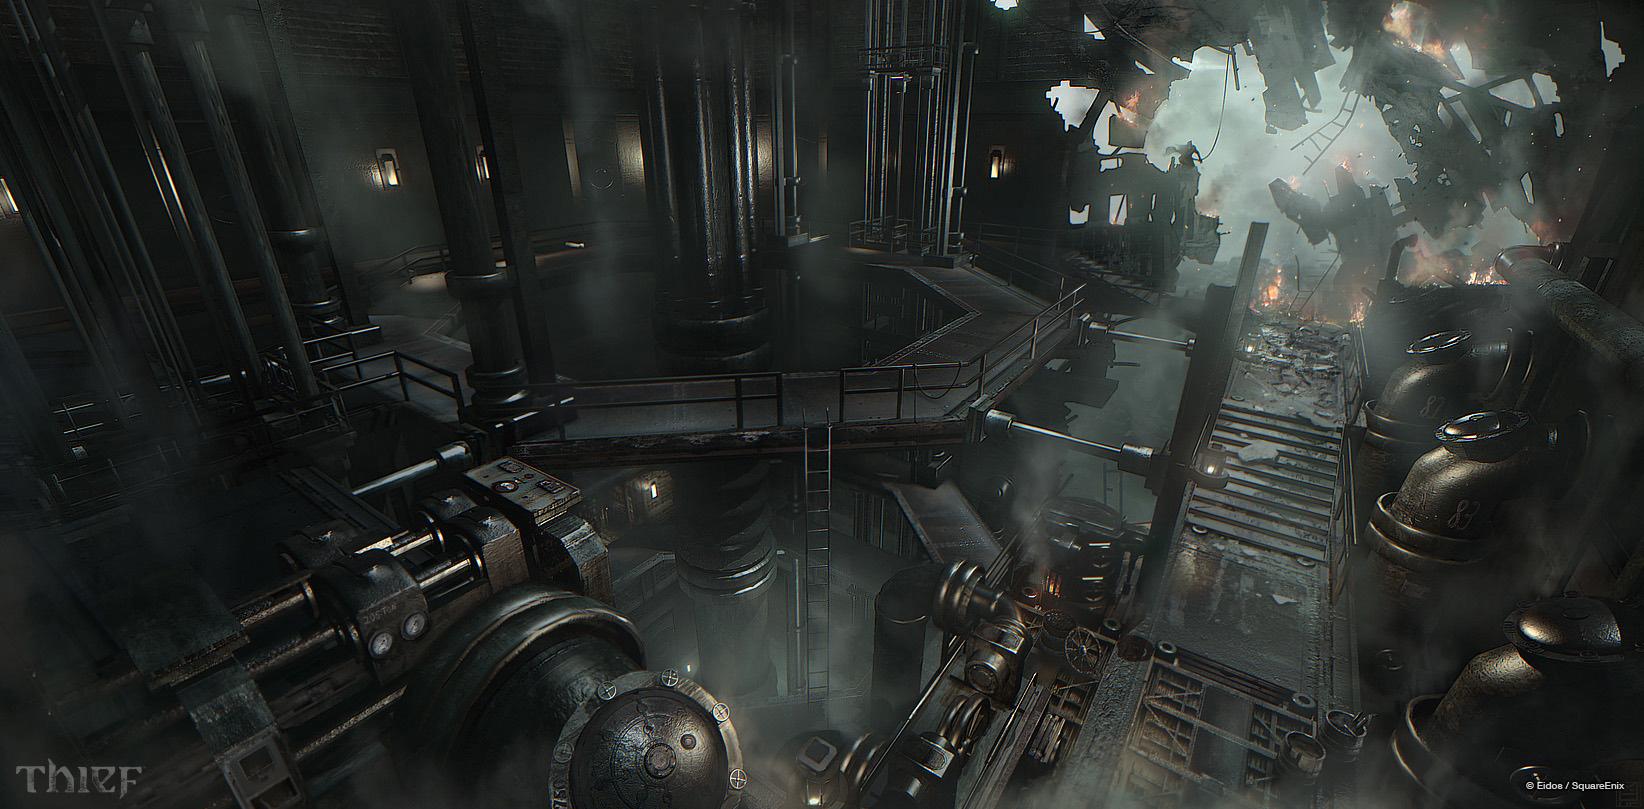 Steambot Studios Talks Thief Concept Art Concept Art World